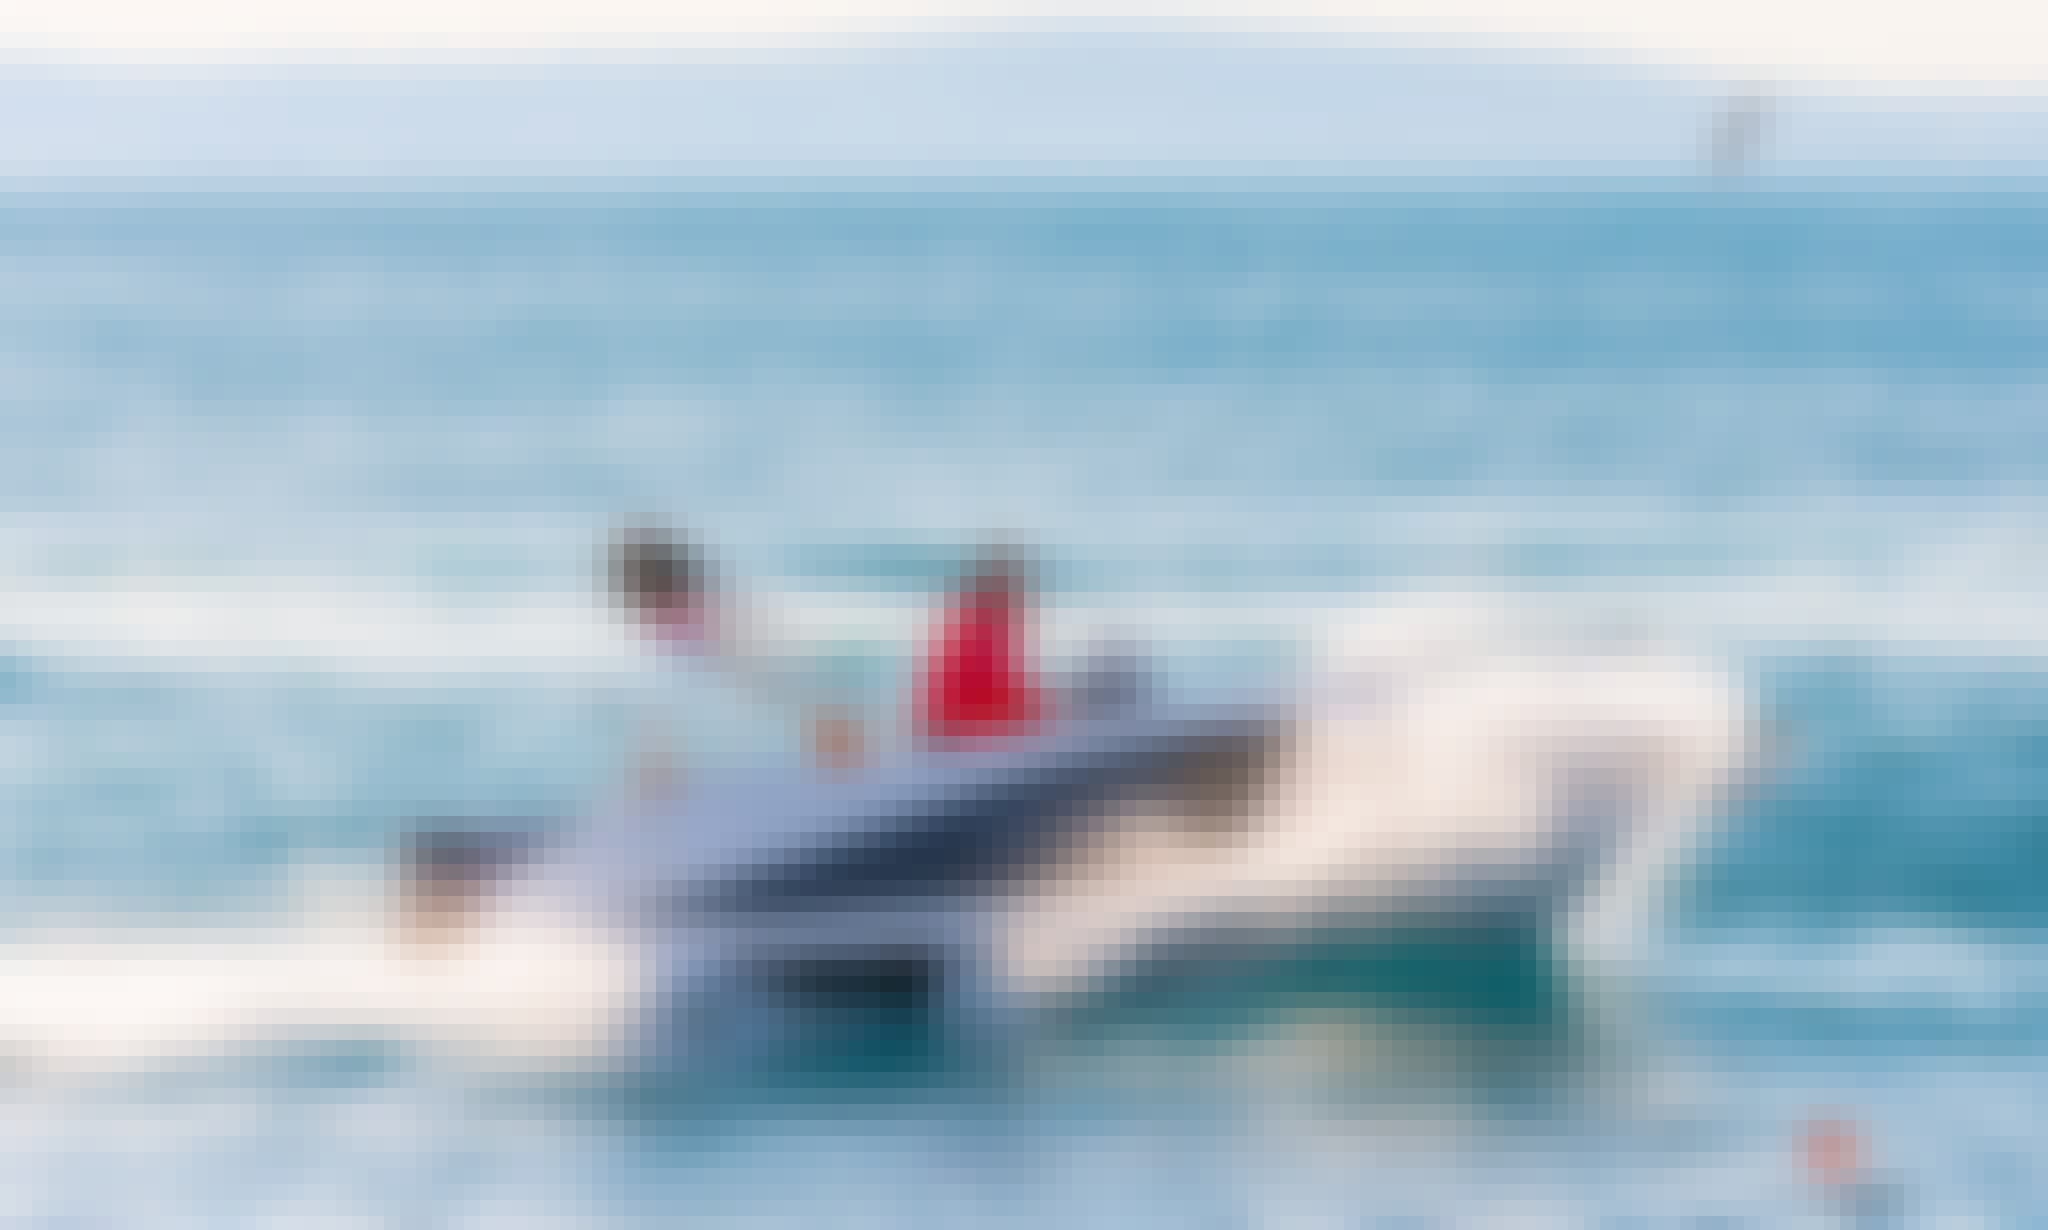 Okiboats Barracuda 545